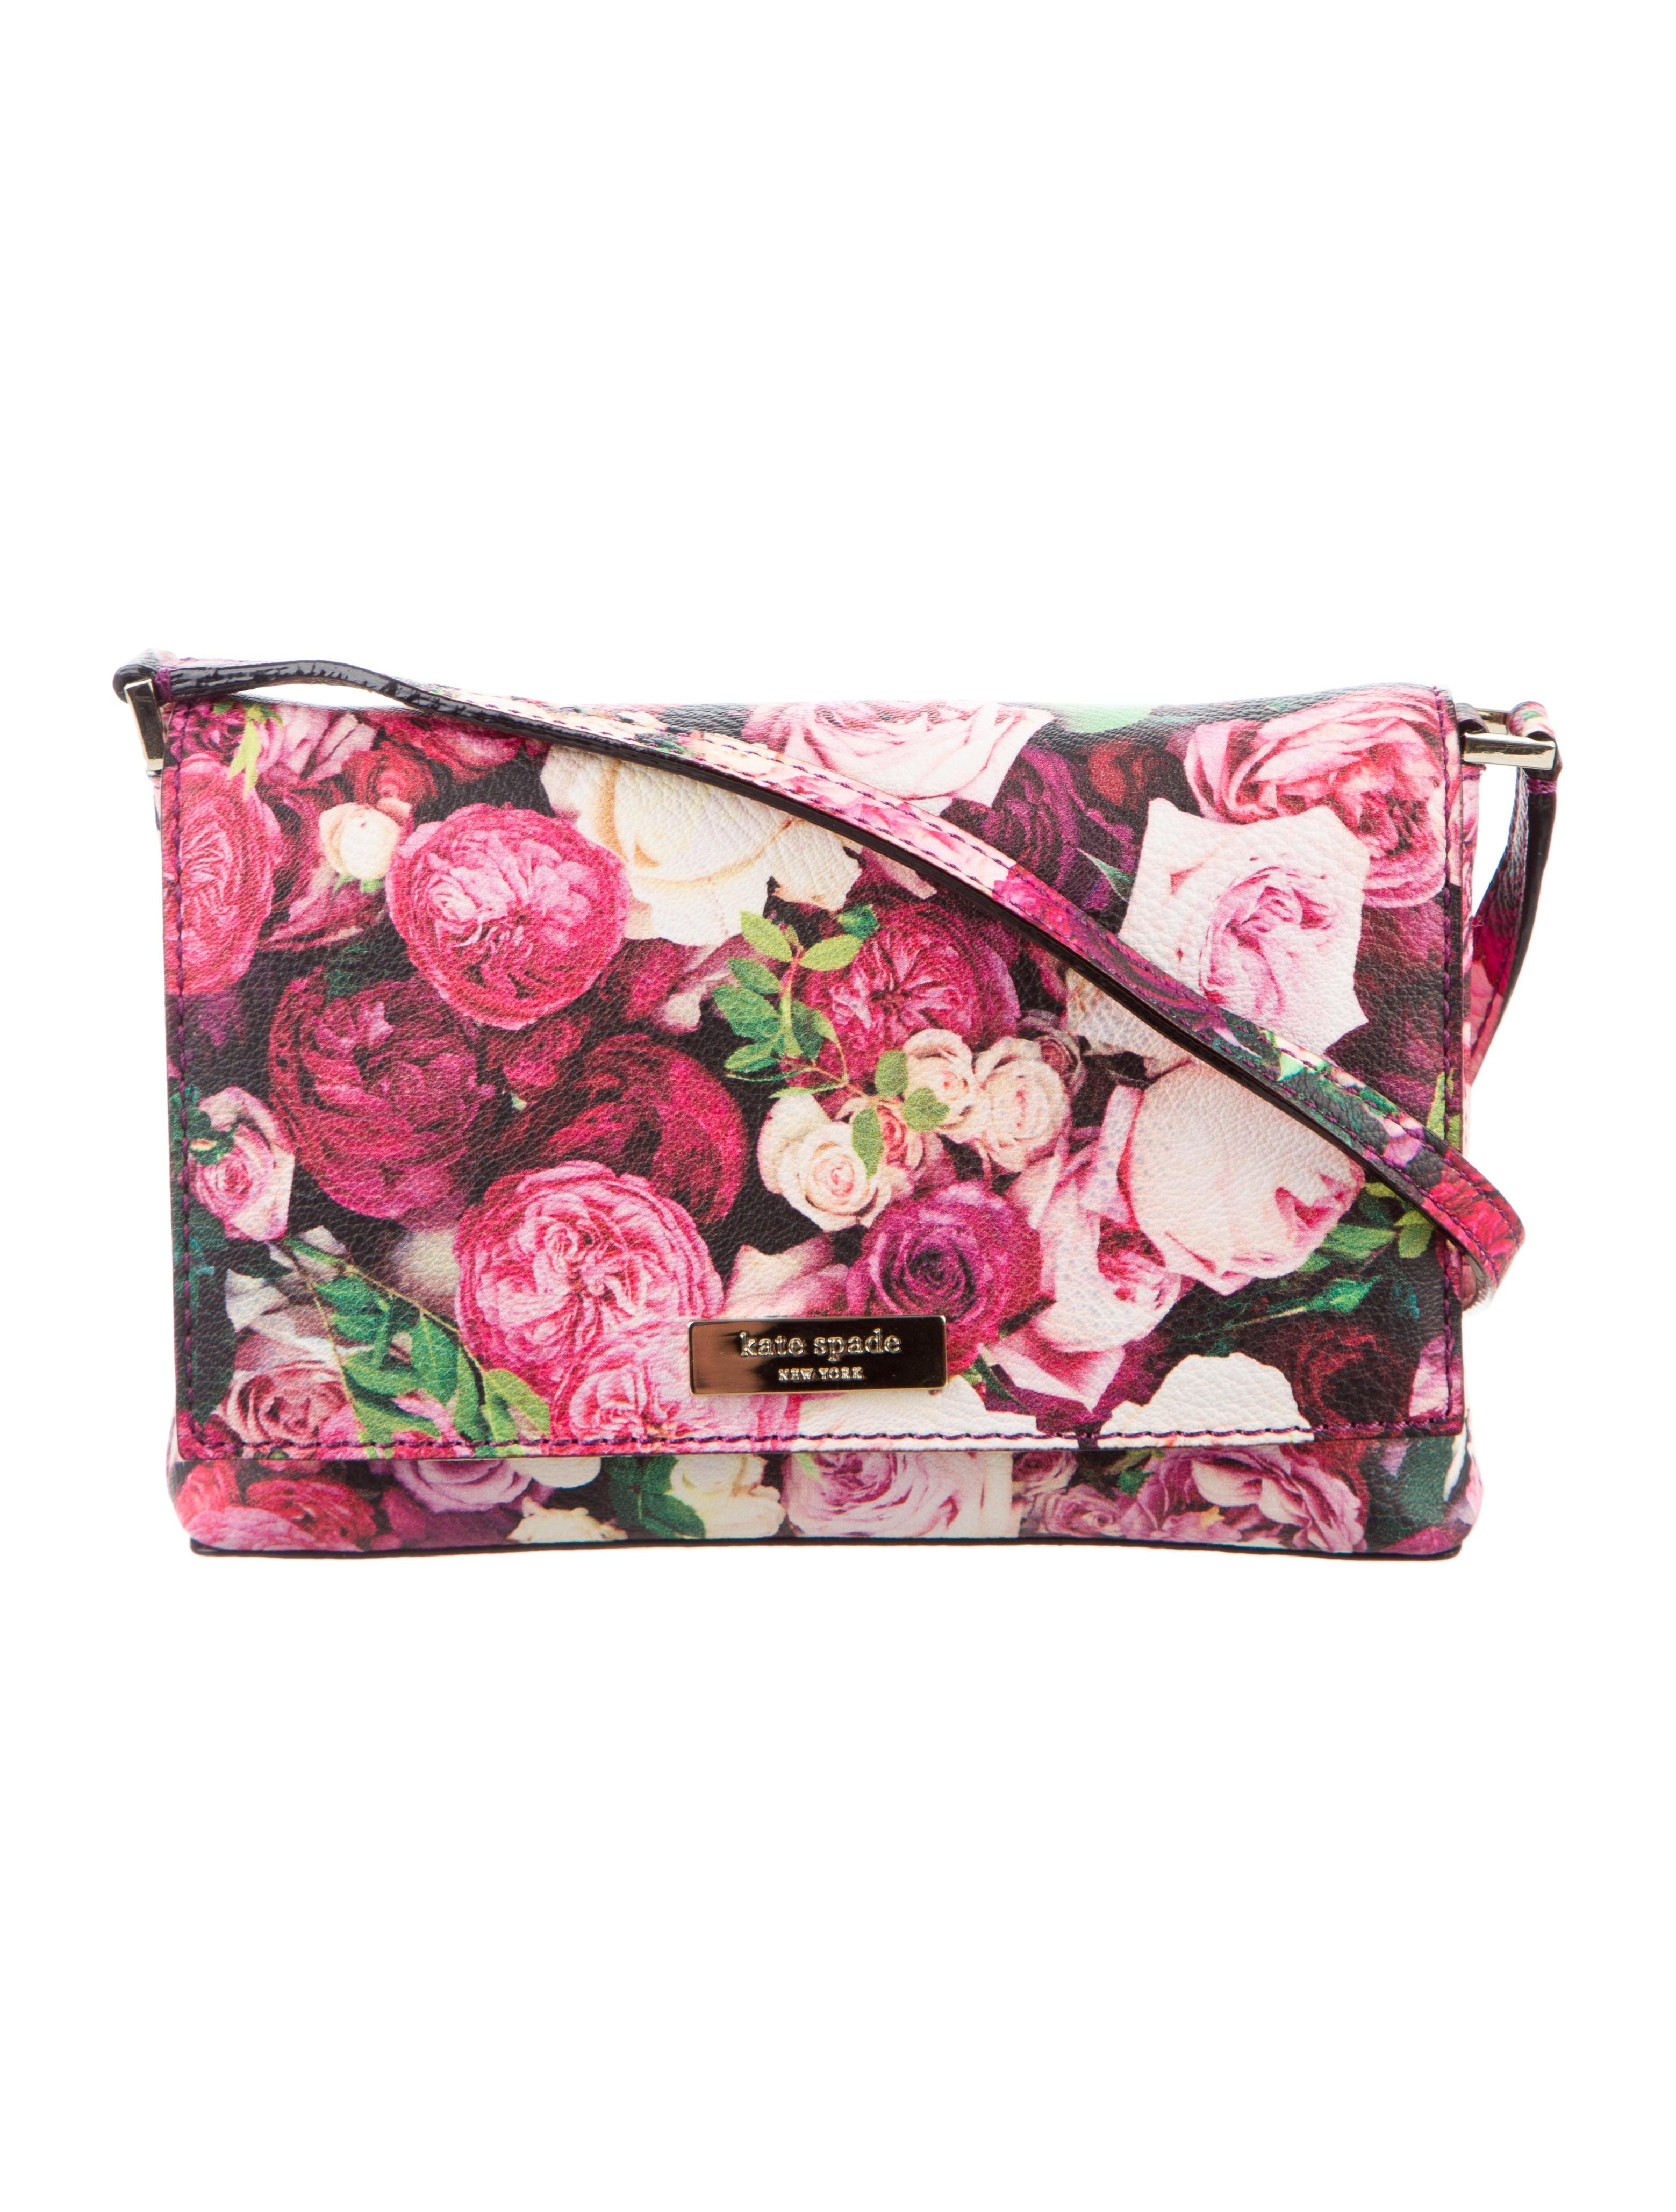 Kate Spade New York Grant Street Floral Sally Crossbody Bag - Handbags - WKA57449 | The RealReal